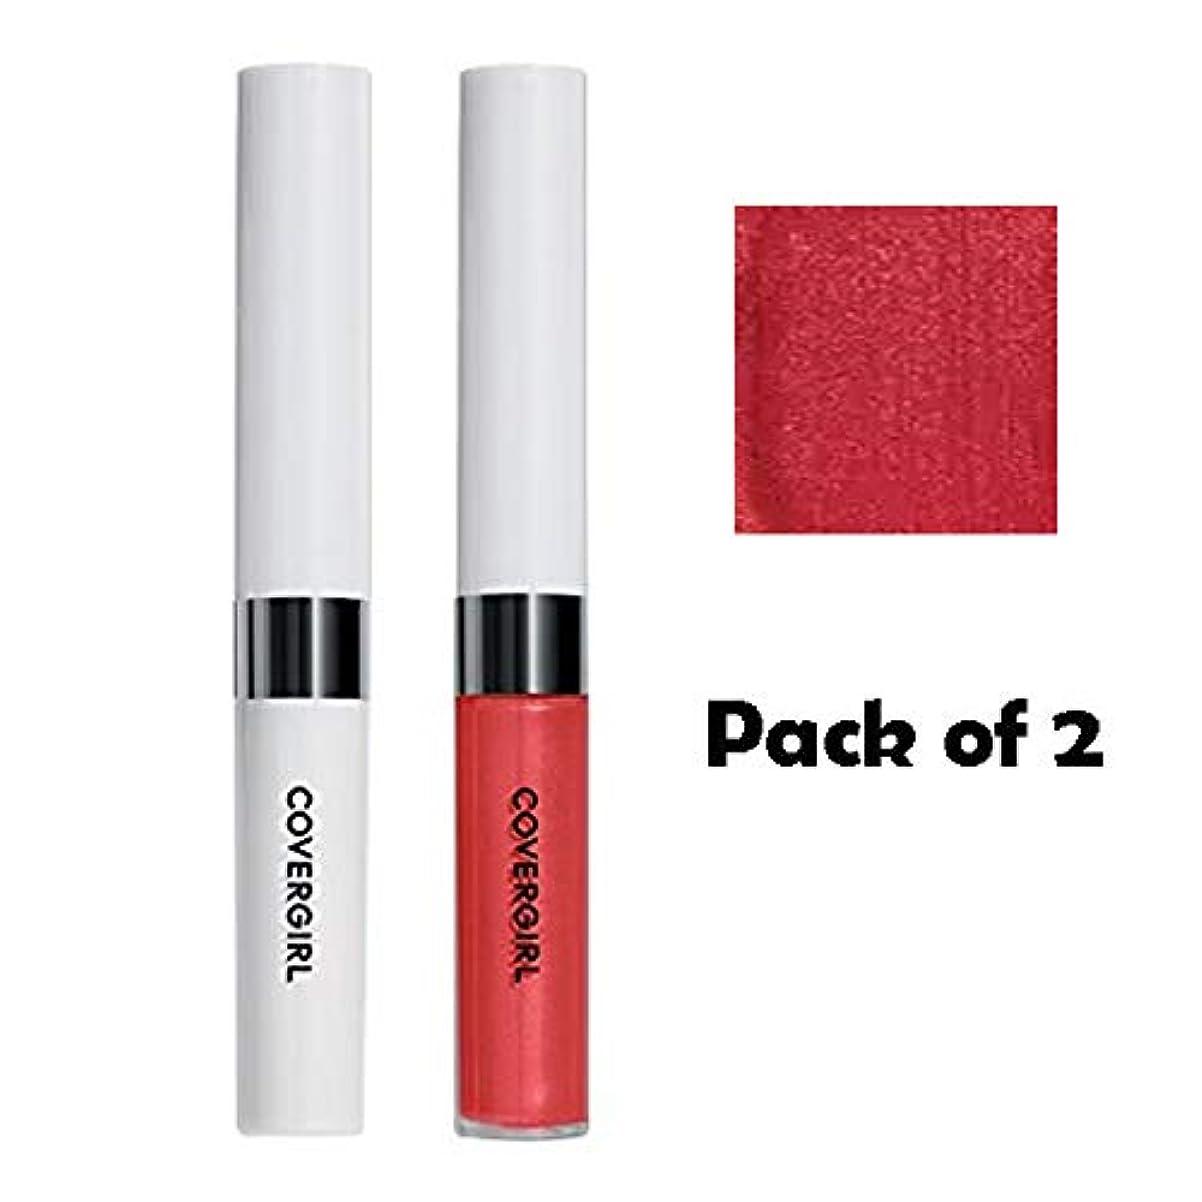 COVERGIRL Outlast All-Day Moisturizing Lip Color - Sparkling Wine 522 (2 Packs) [海外直送品] [並行輸入品]